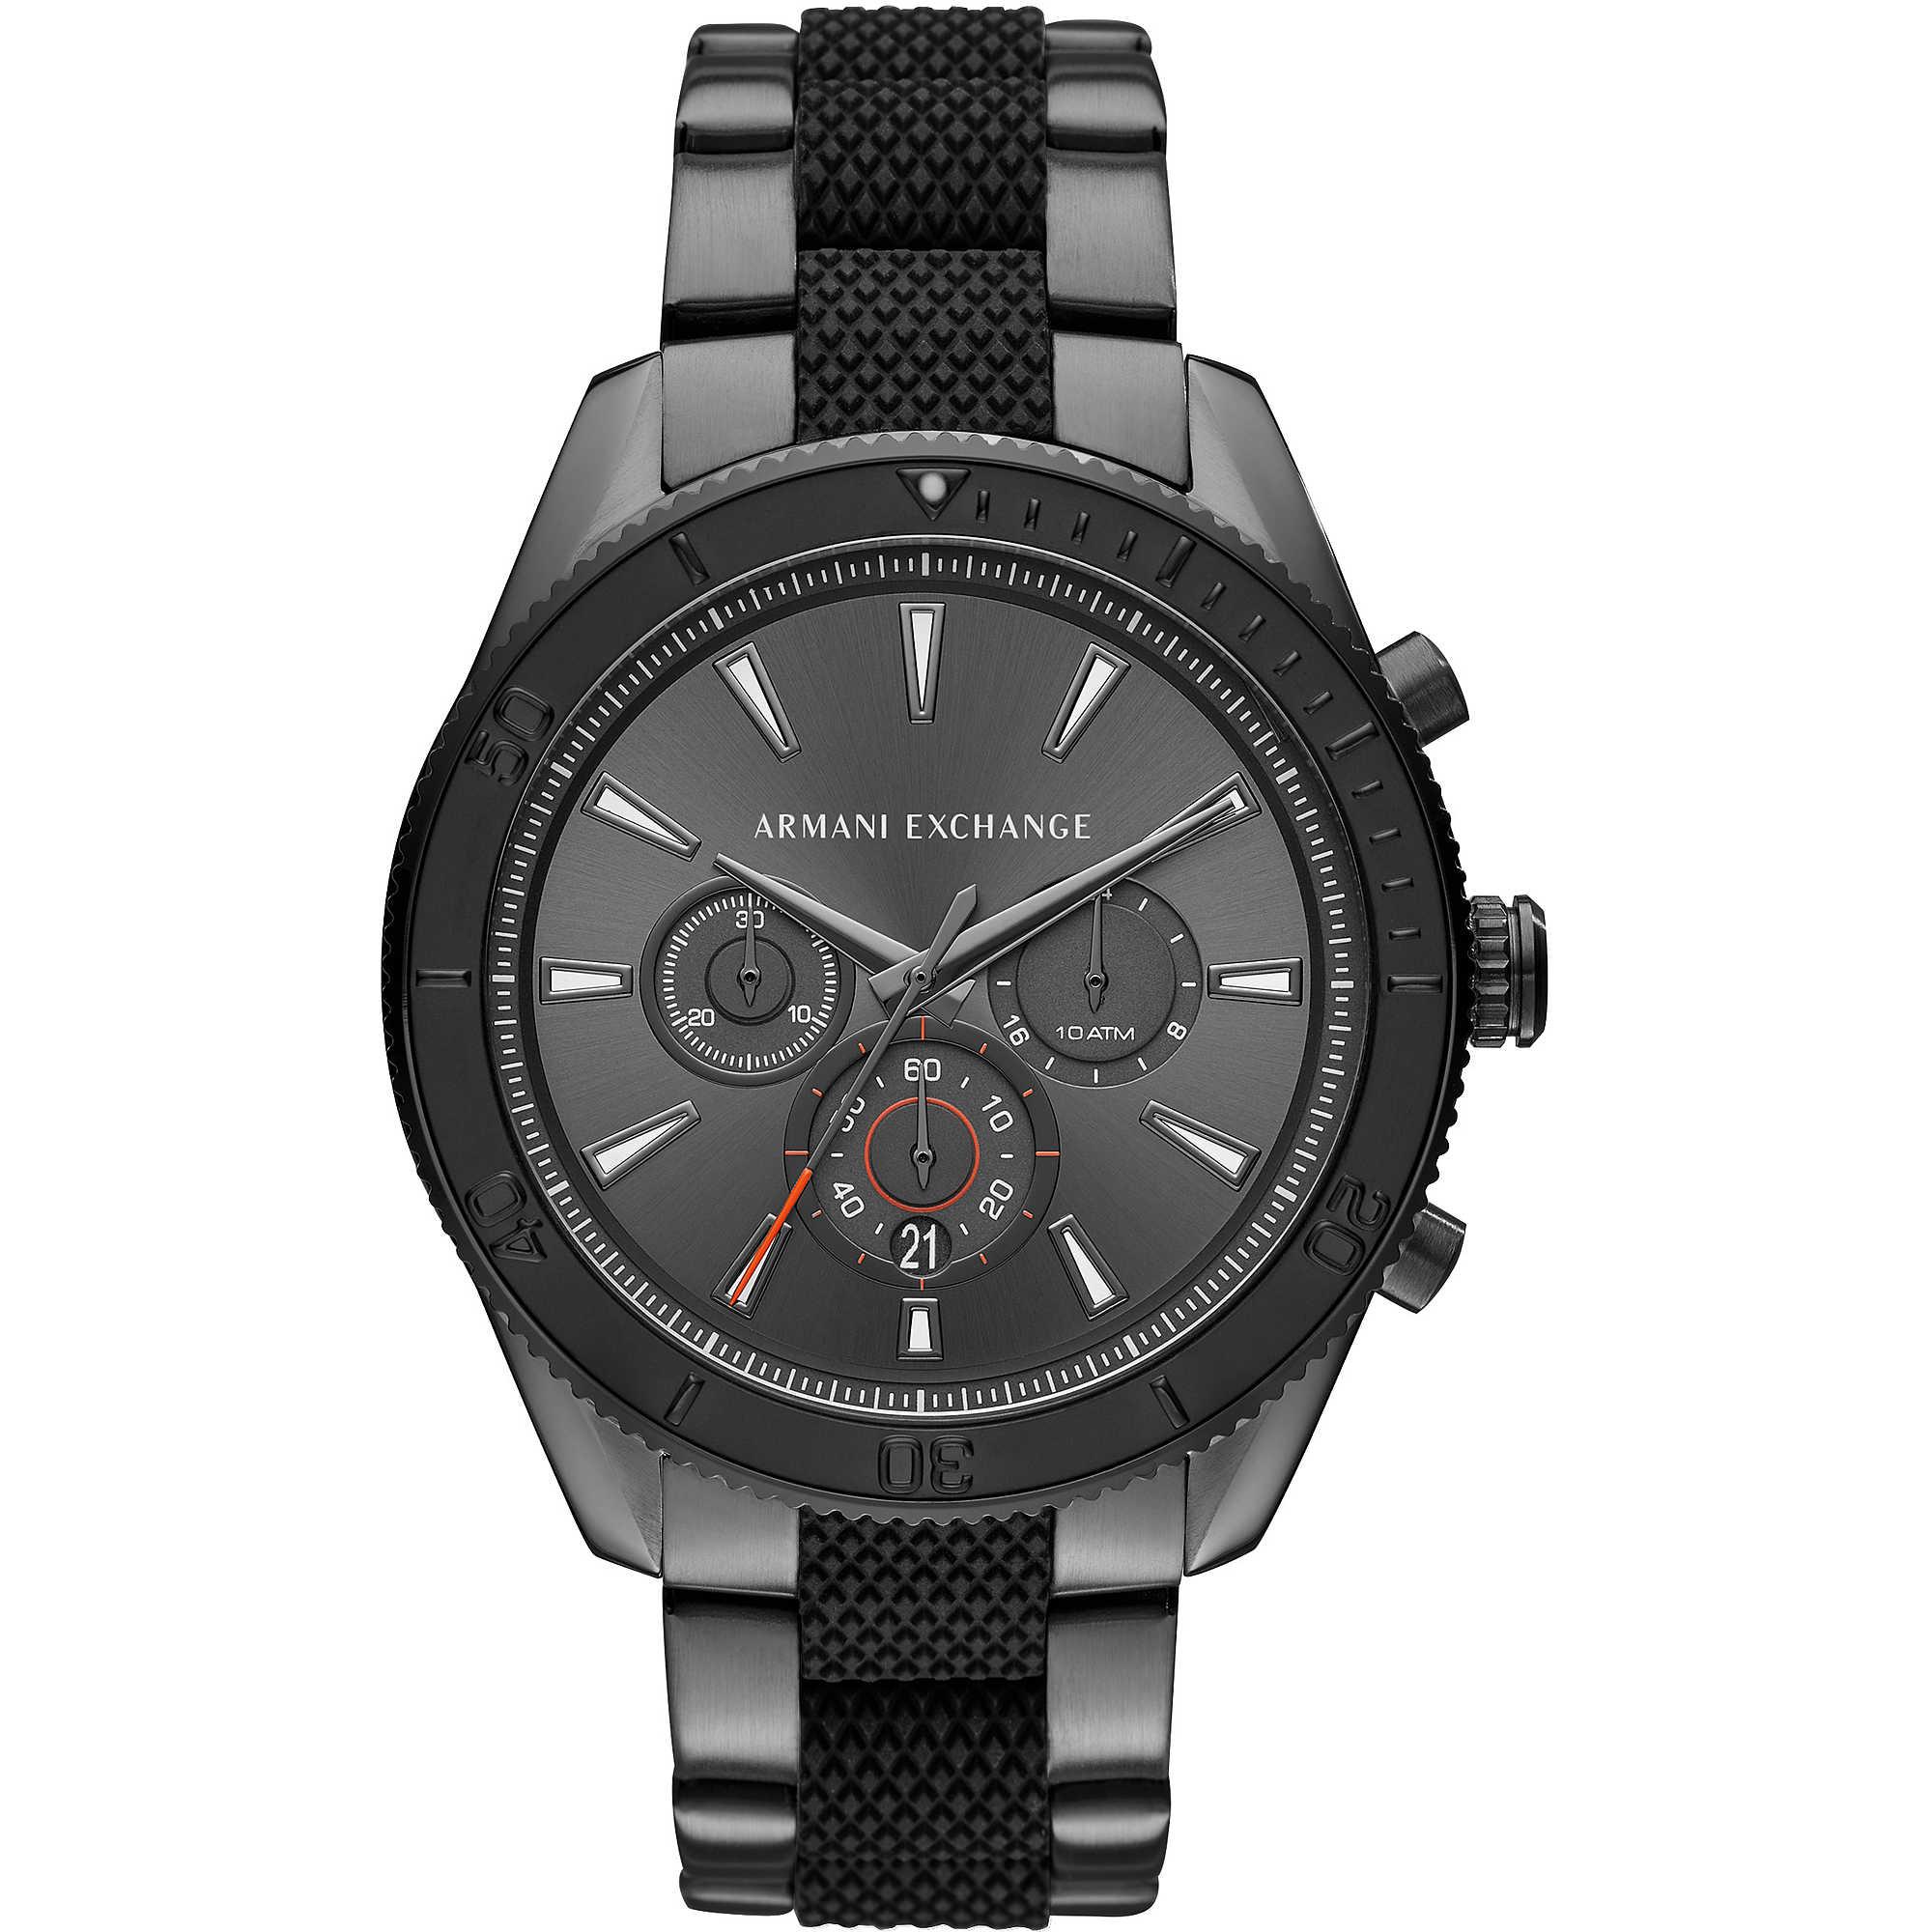 Enzo Bands: Watch Chronograph Man Armani Exchange Enzo AX1816